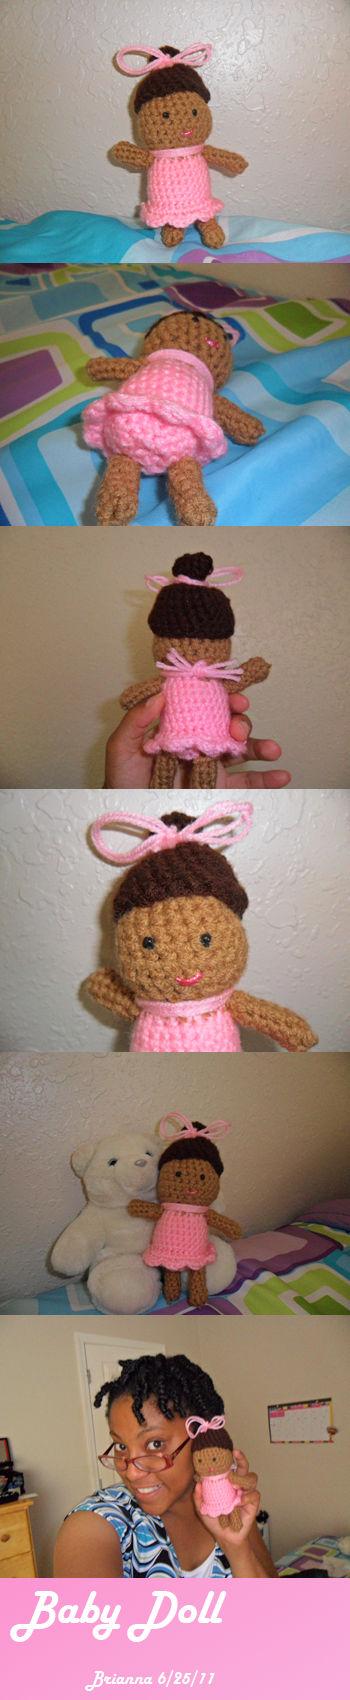 Baby Doll - Crochet